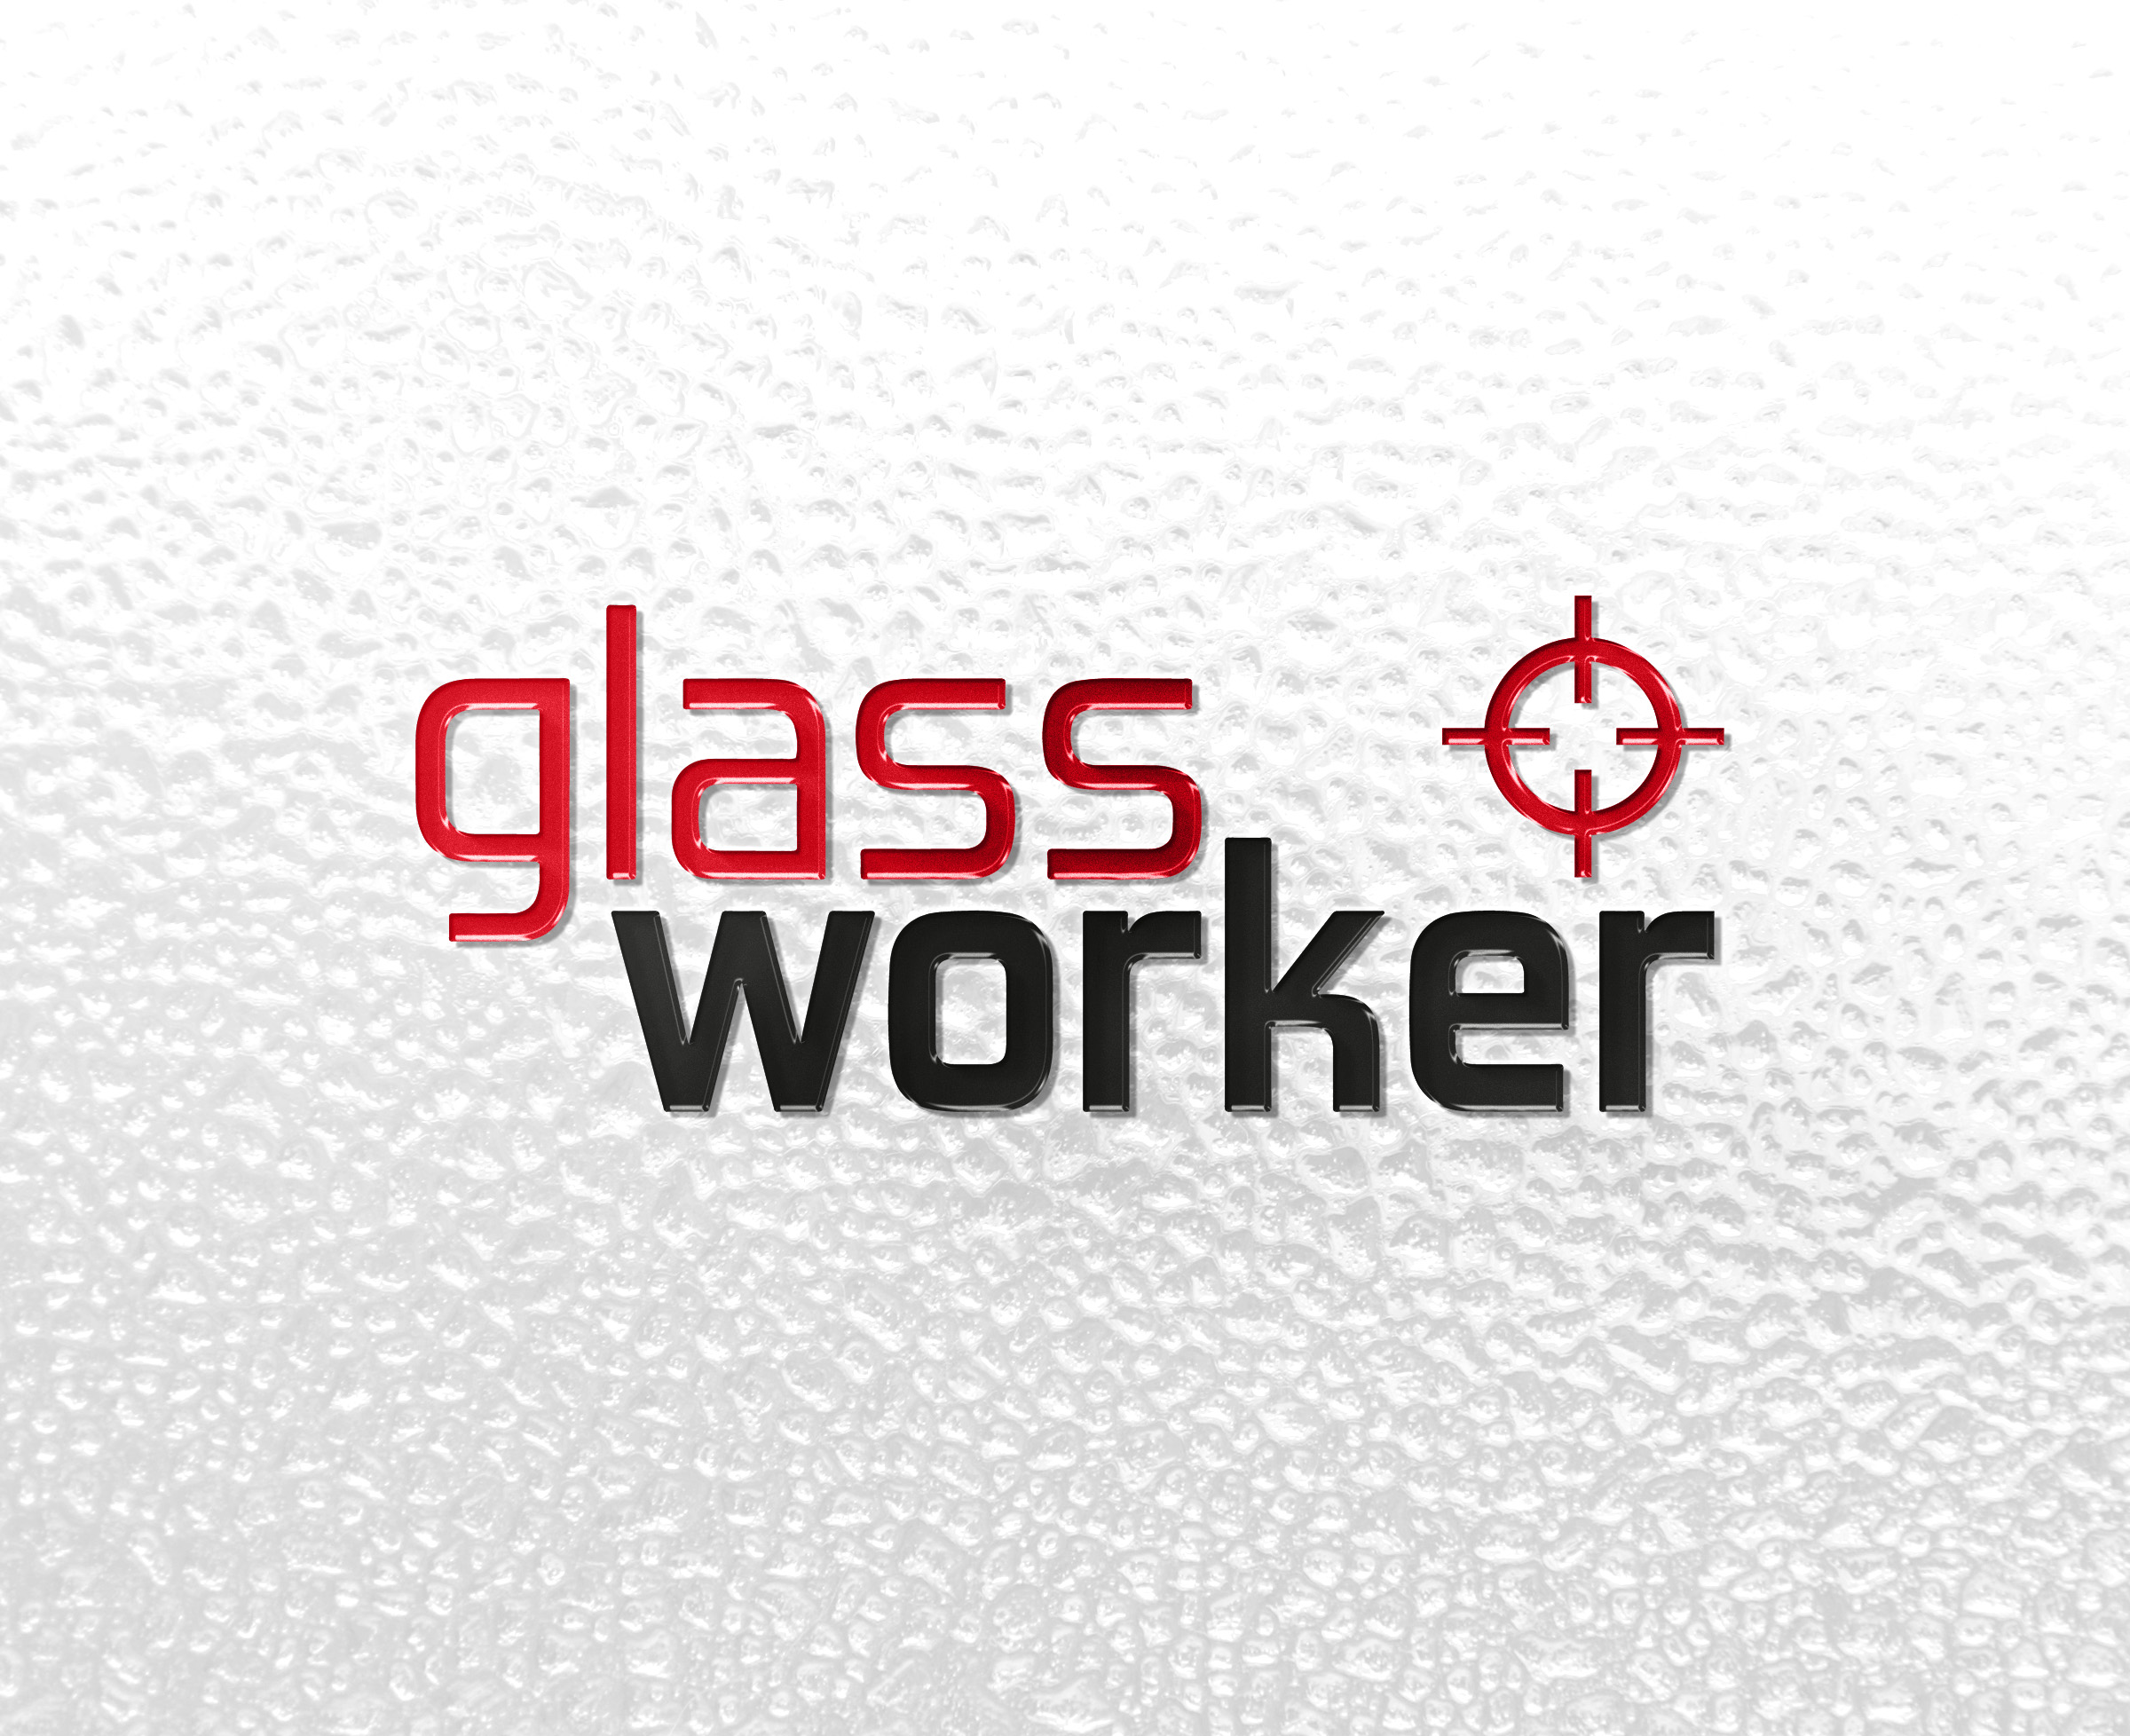 Glassworker Lifting Gear